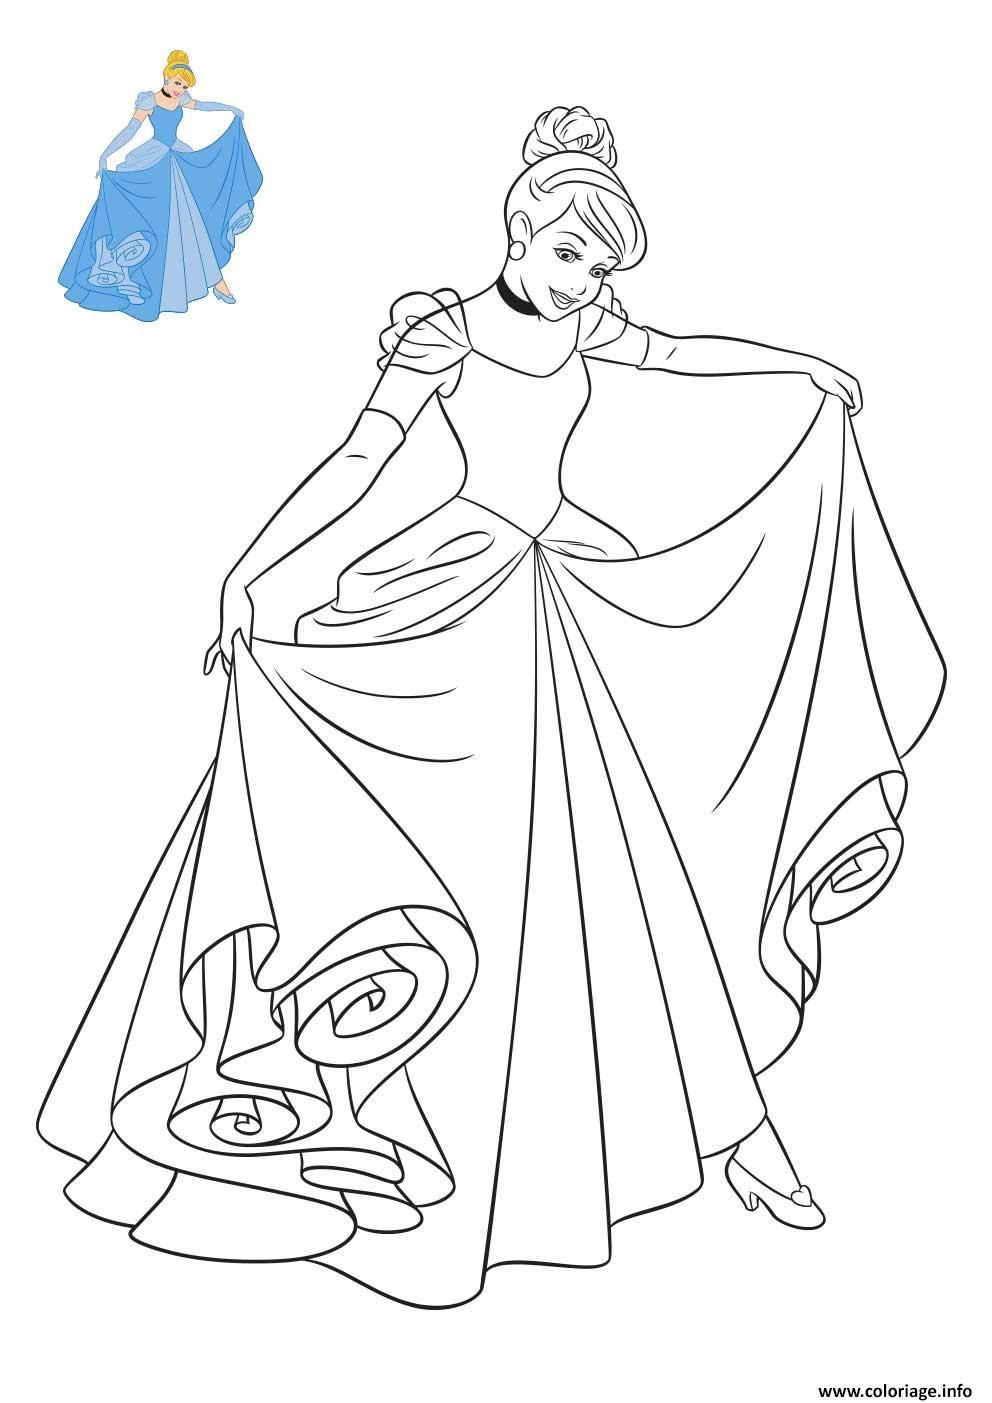 Coloriage Princesse Disney Cendrillon Dessin Princesse Disney A Imprimer